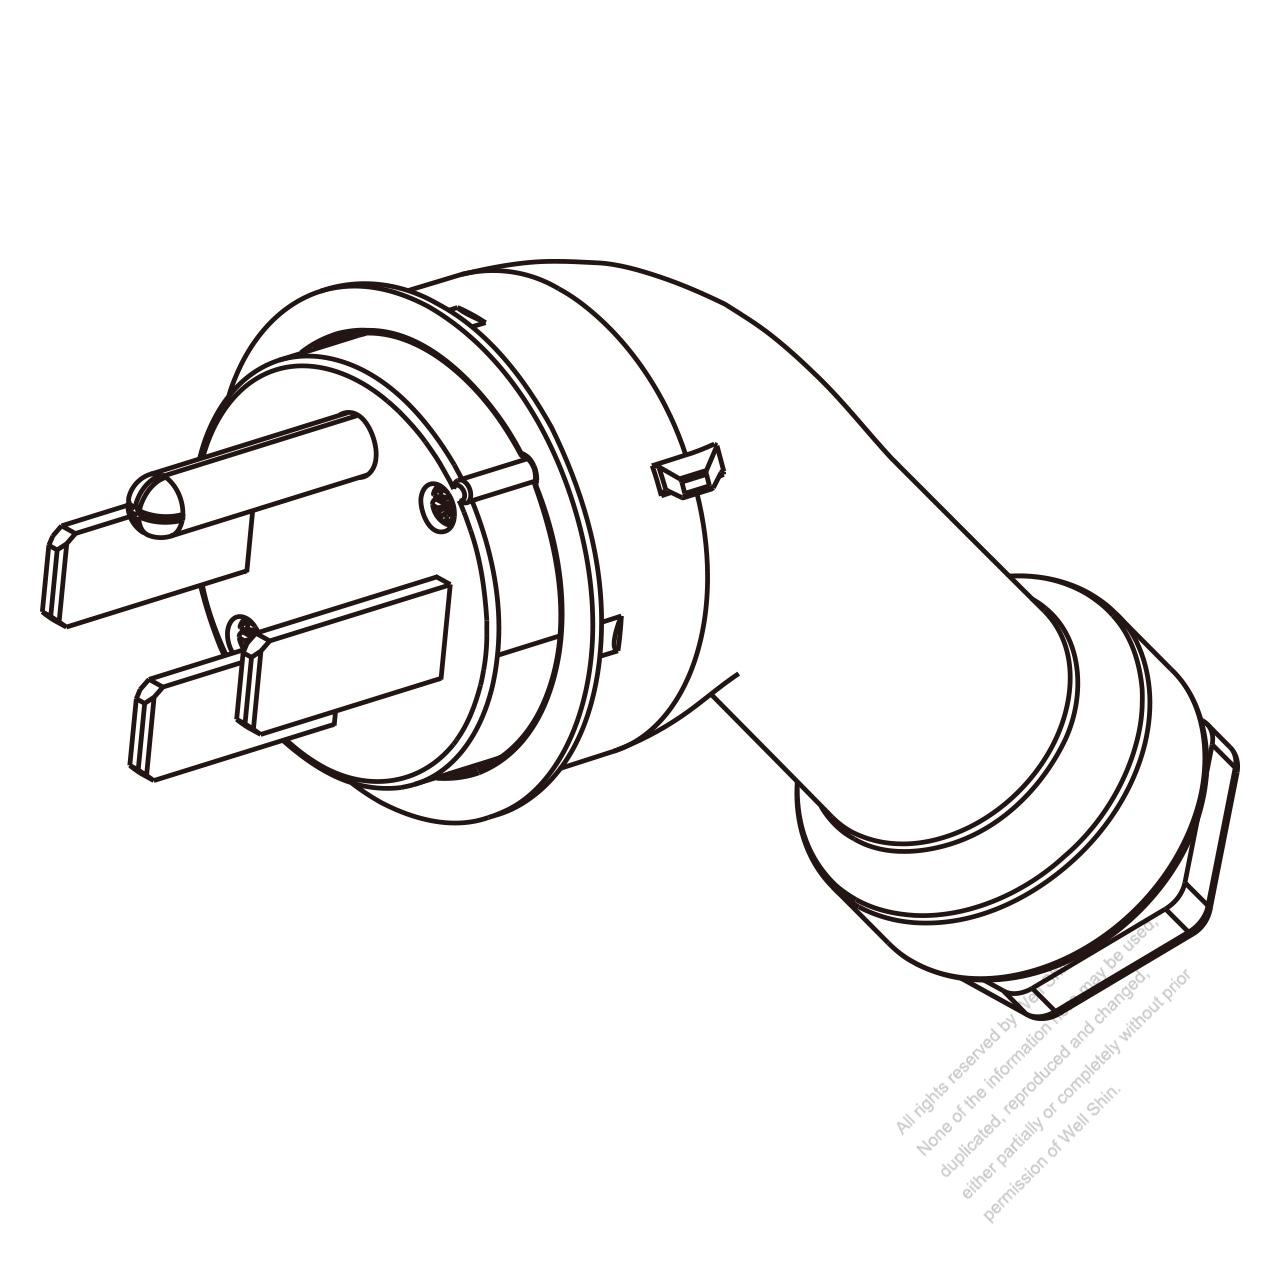 Usa Canada Rv Plug Nema 14 50p 4 Pin Straight 3 P Wire How To